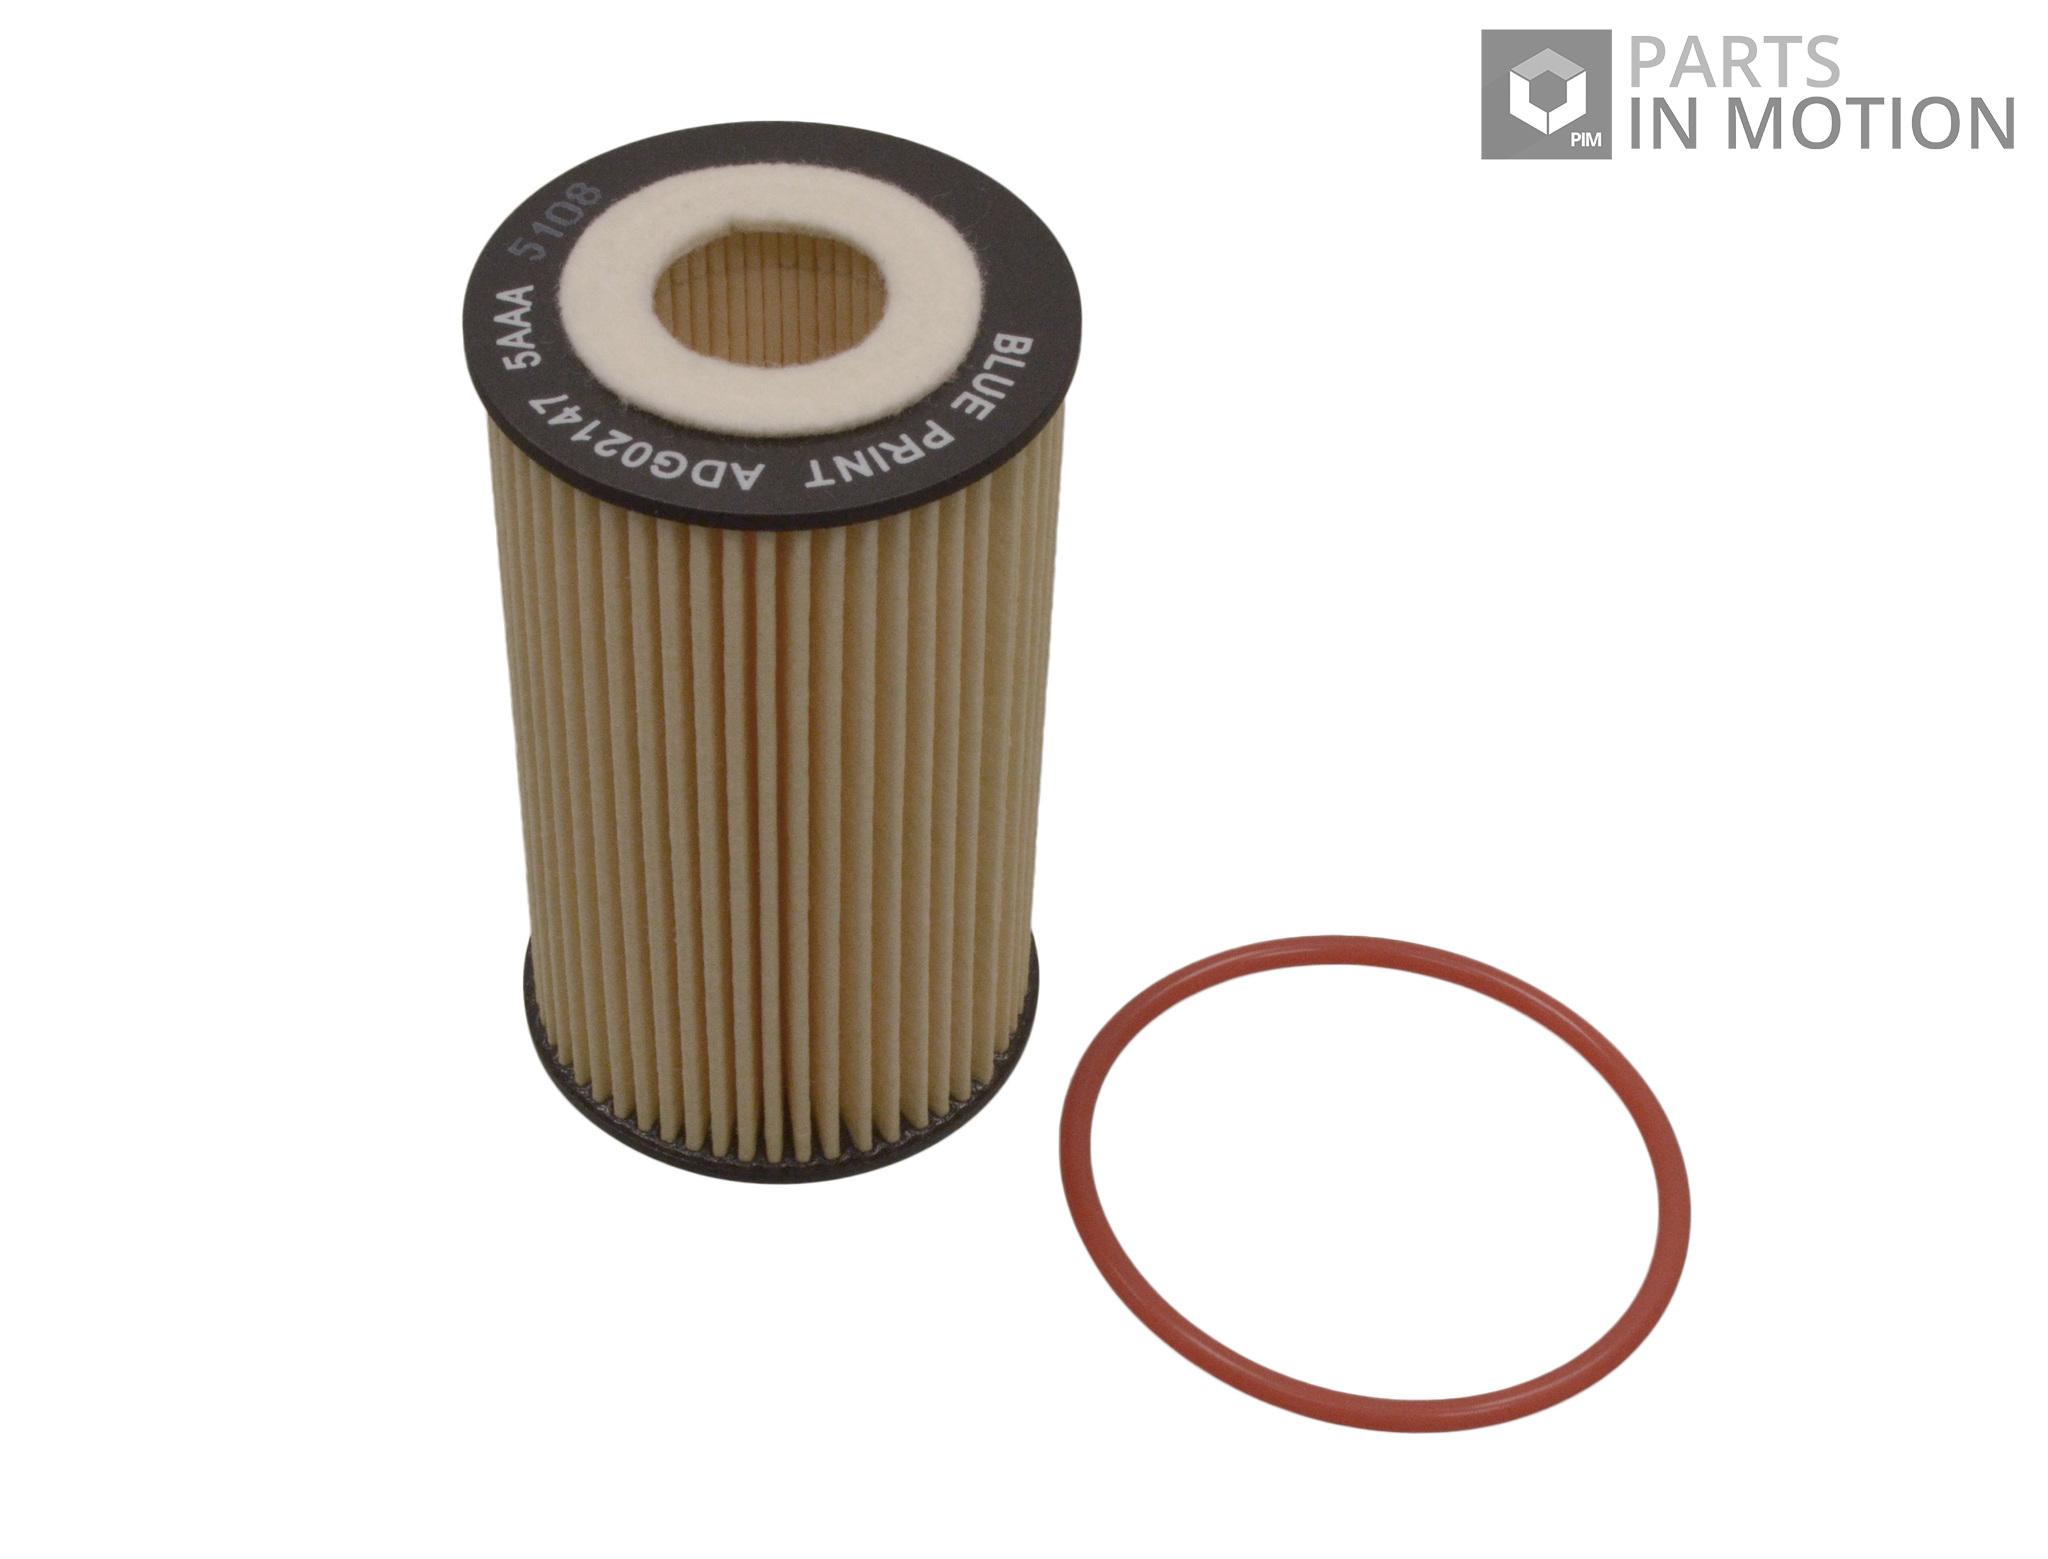 Vauxhall Vectra MK2//C 1.8 16V Genuine Fram Fuel Filter Service Replacement